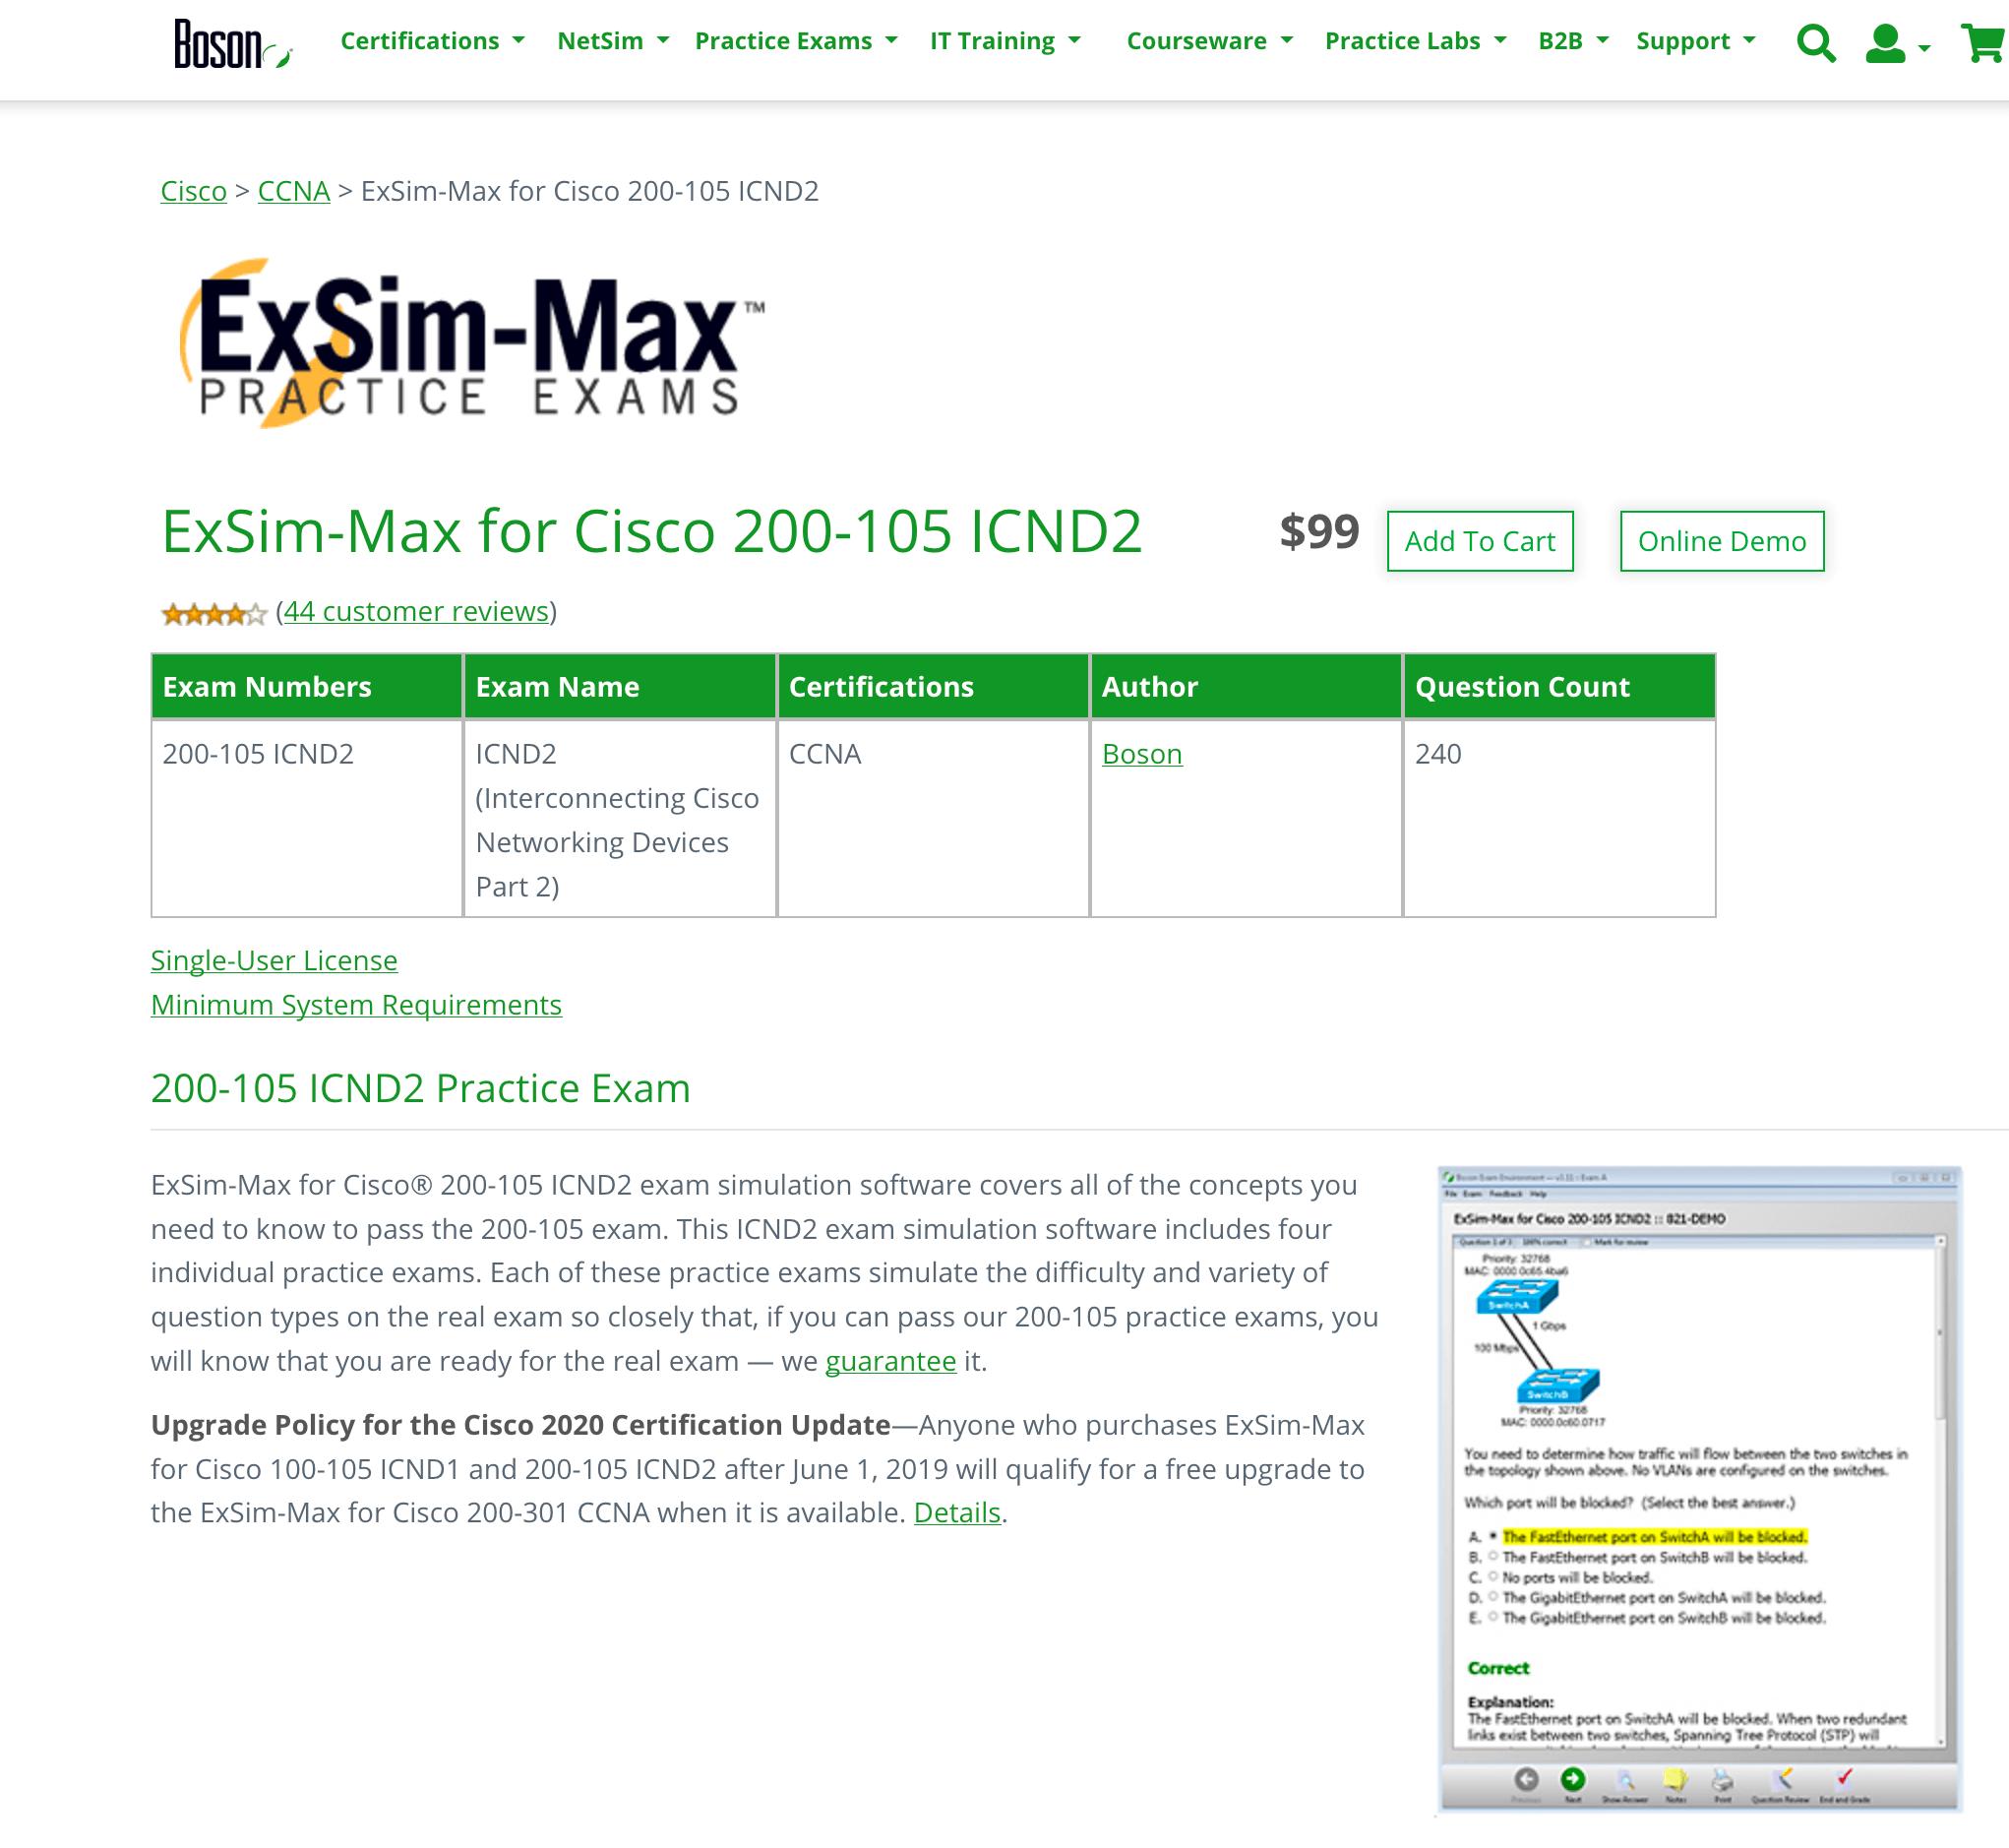 ExSim-Max for Cisco 200-105 ICND2  best value